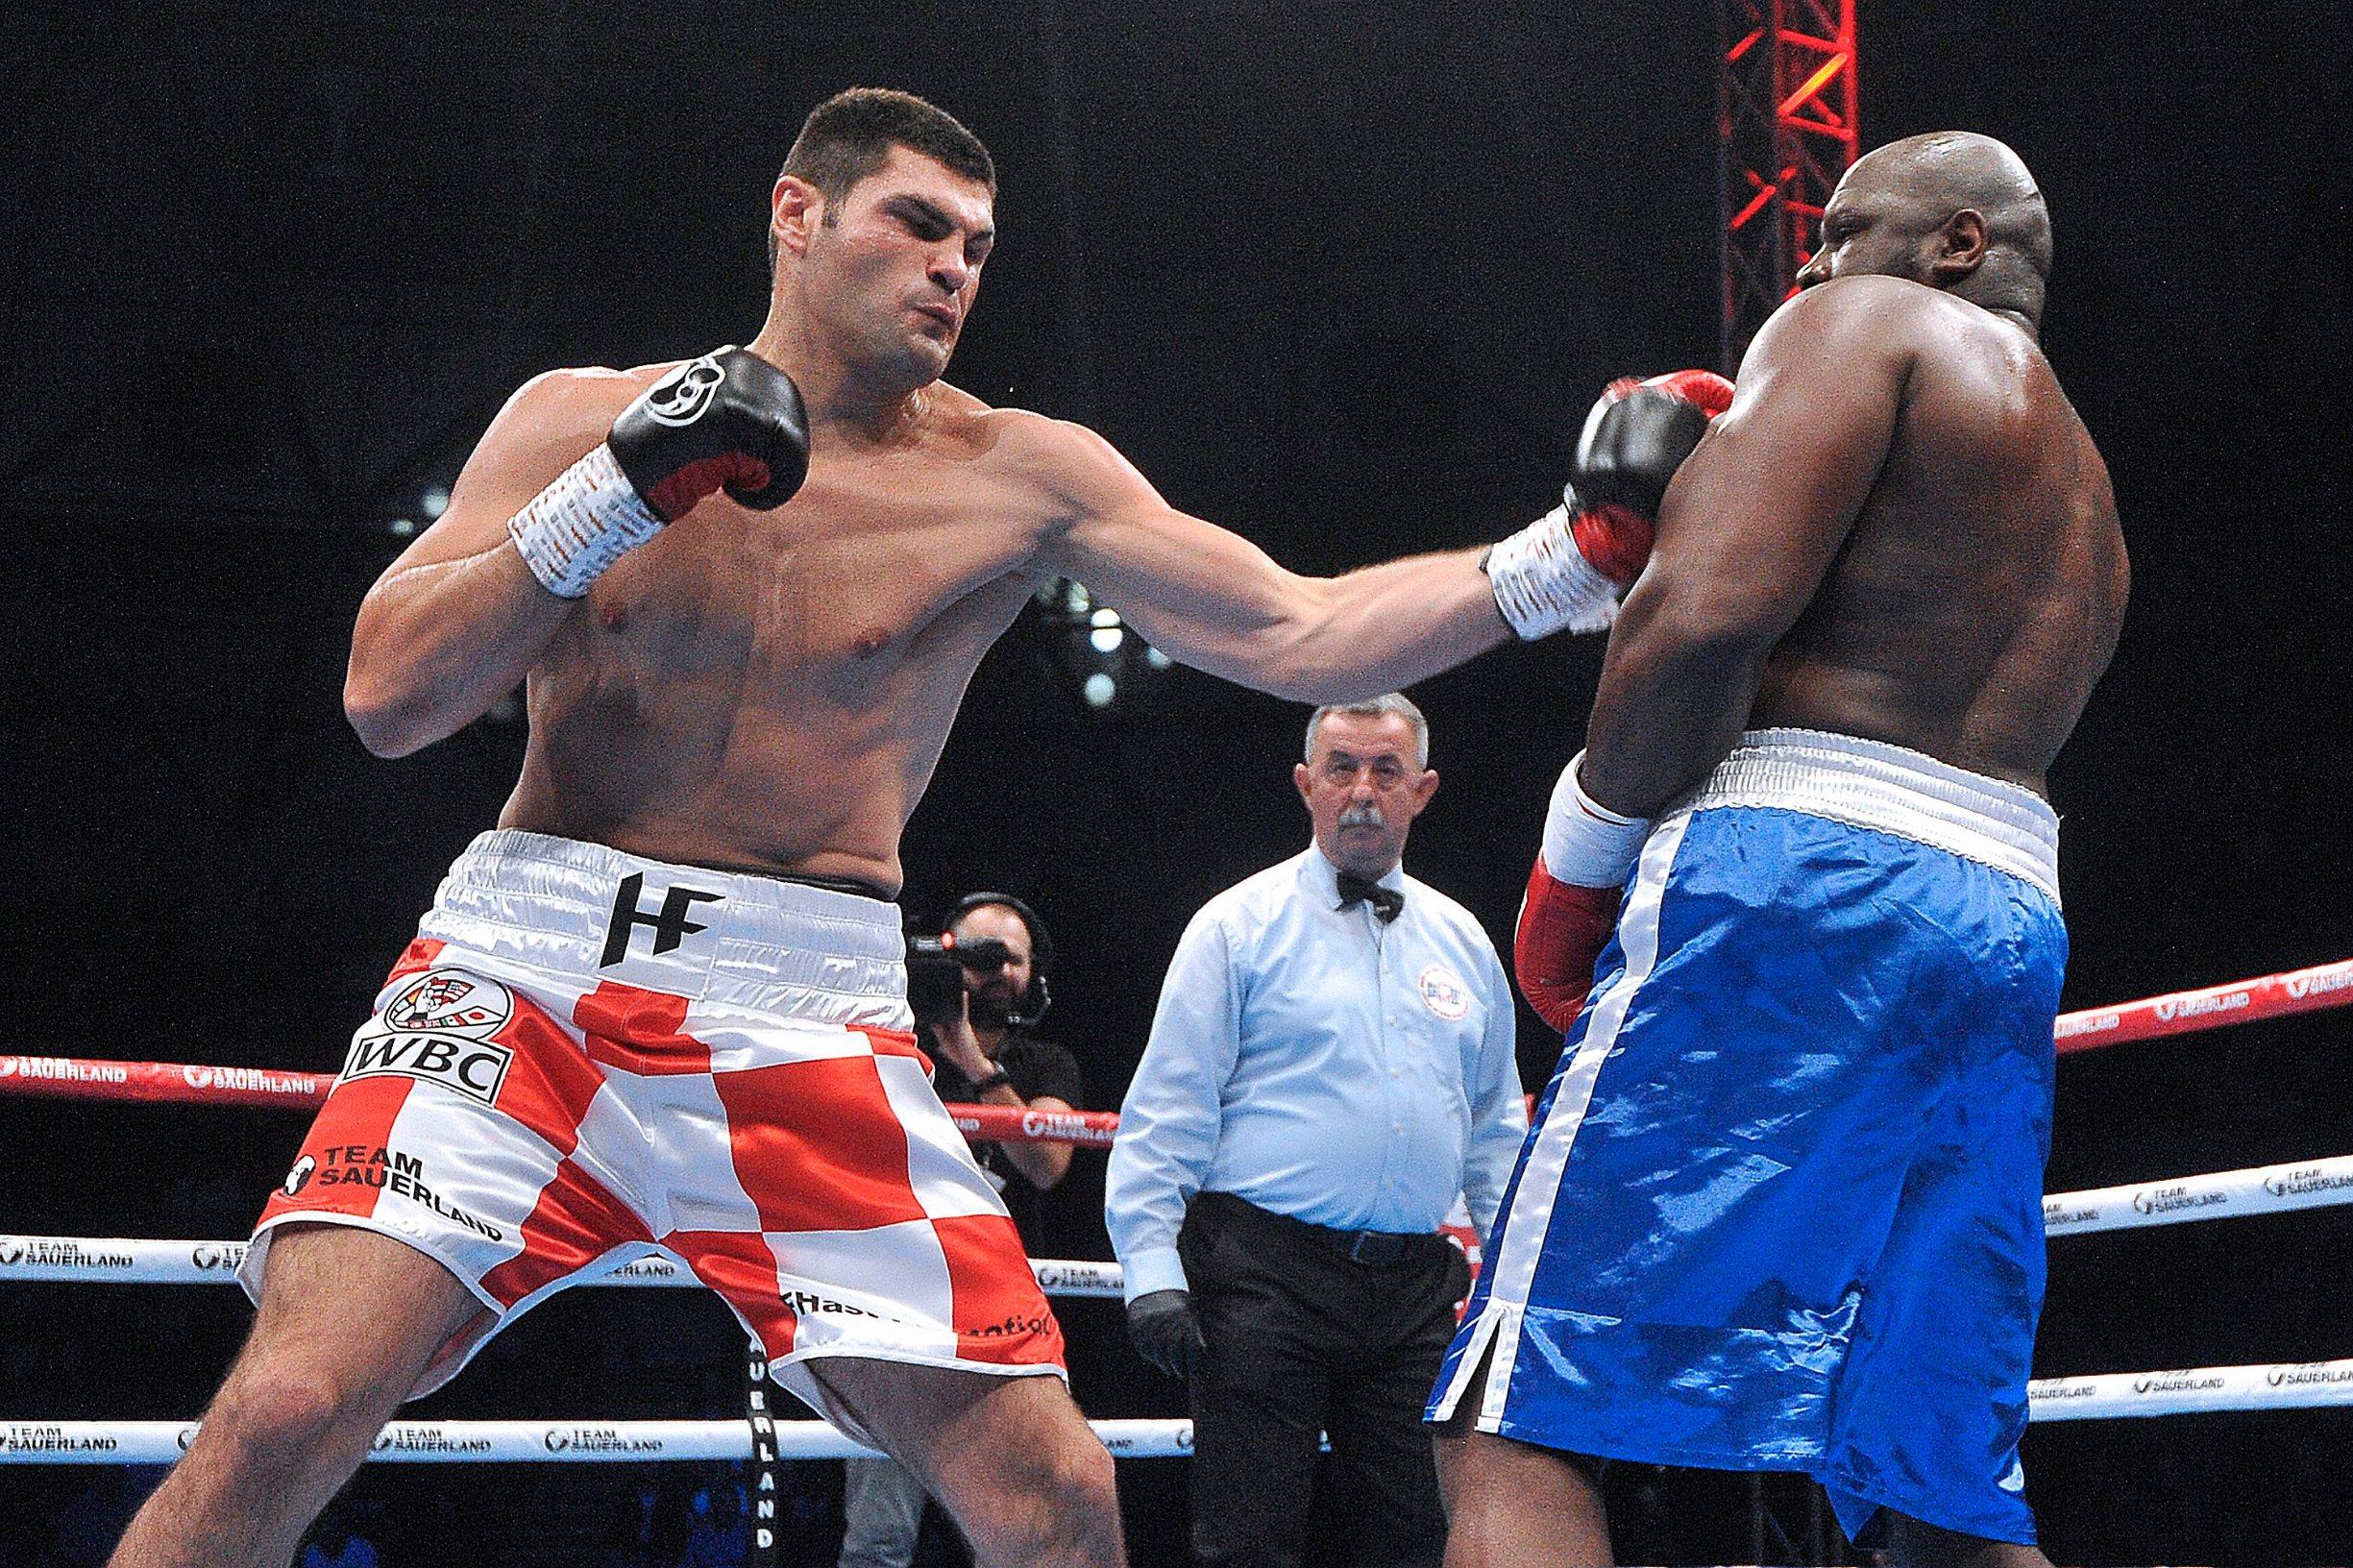 Filip Hrgović vs. Kevin Johnson